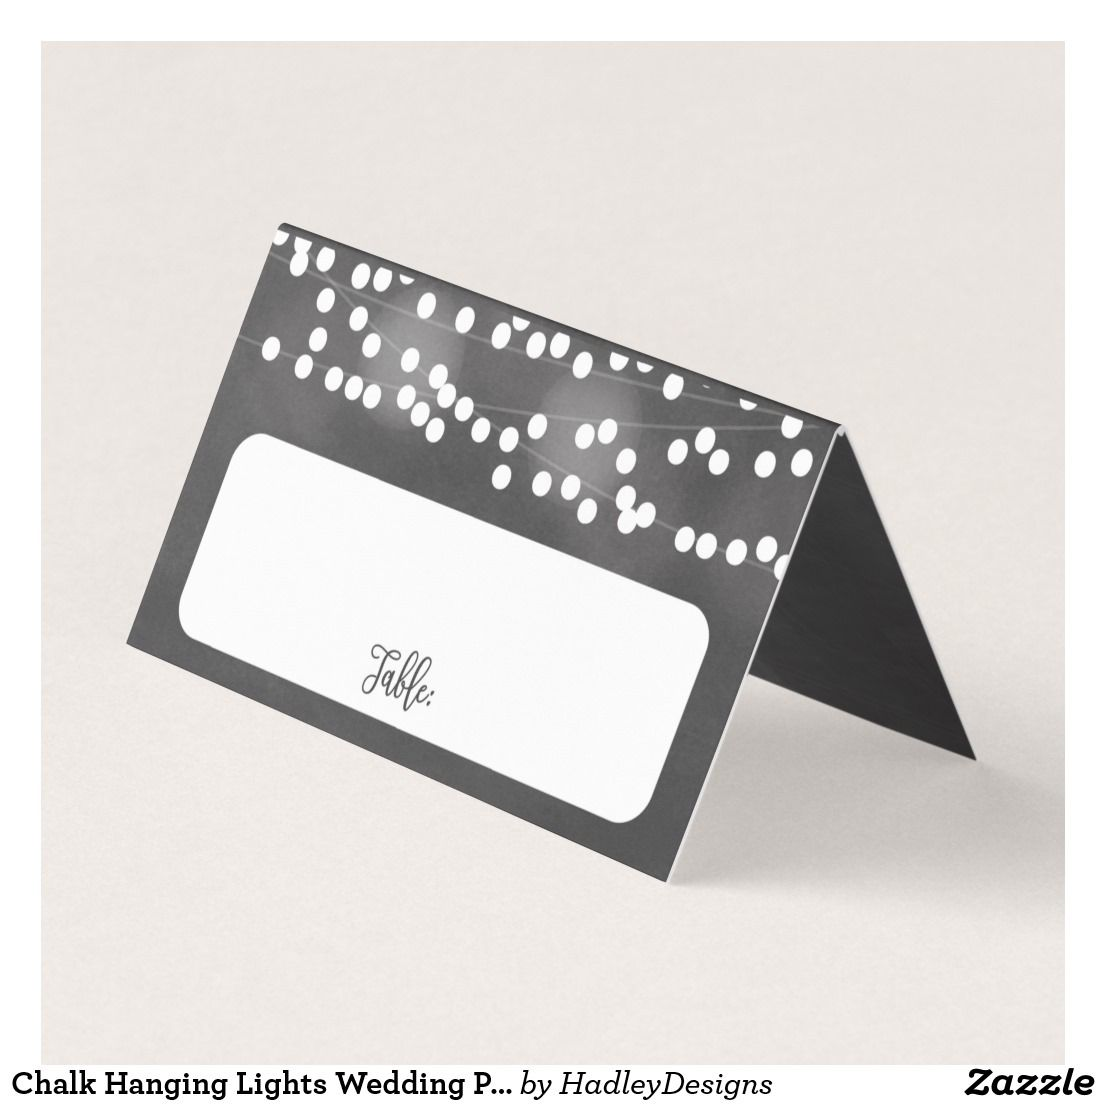 Chalk Hanging Lights Wedding Place Cards | Zazzle Stationery ...